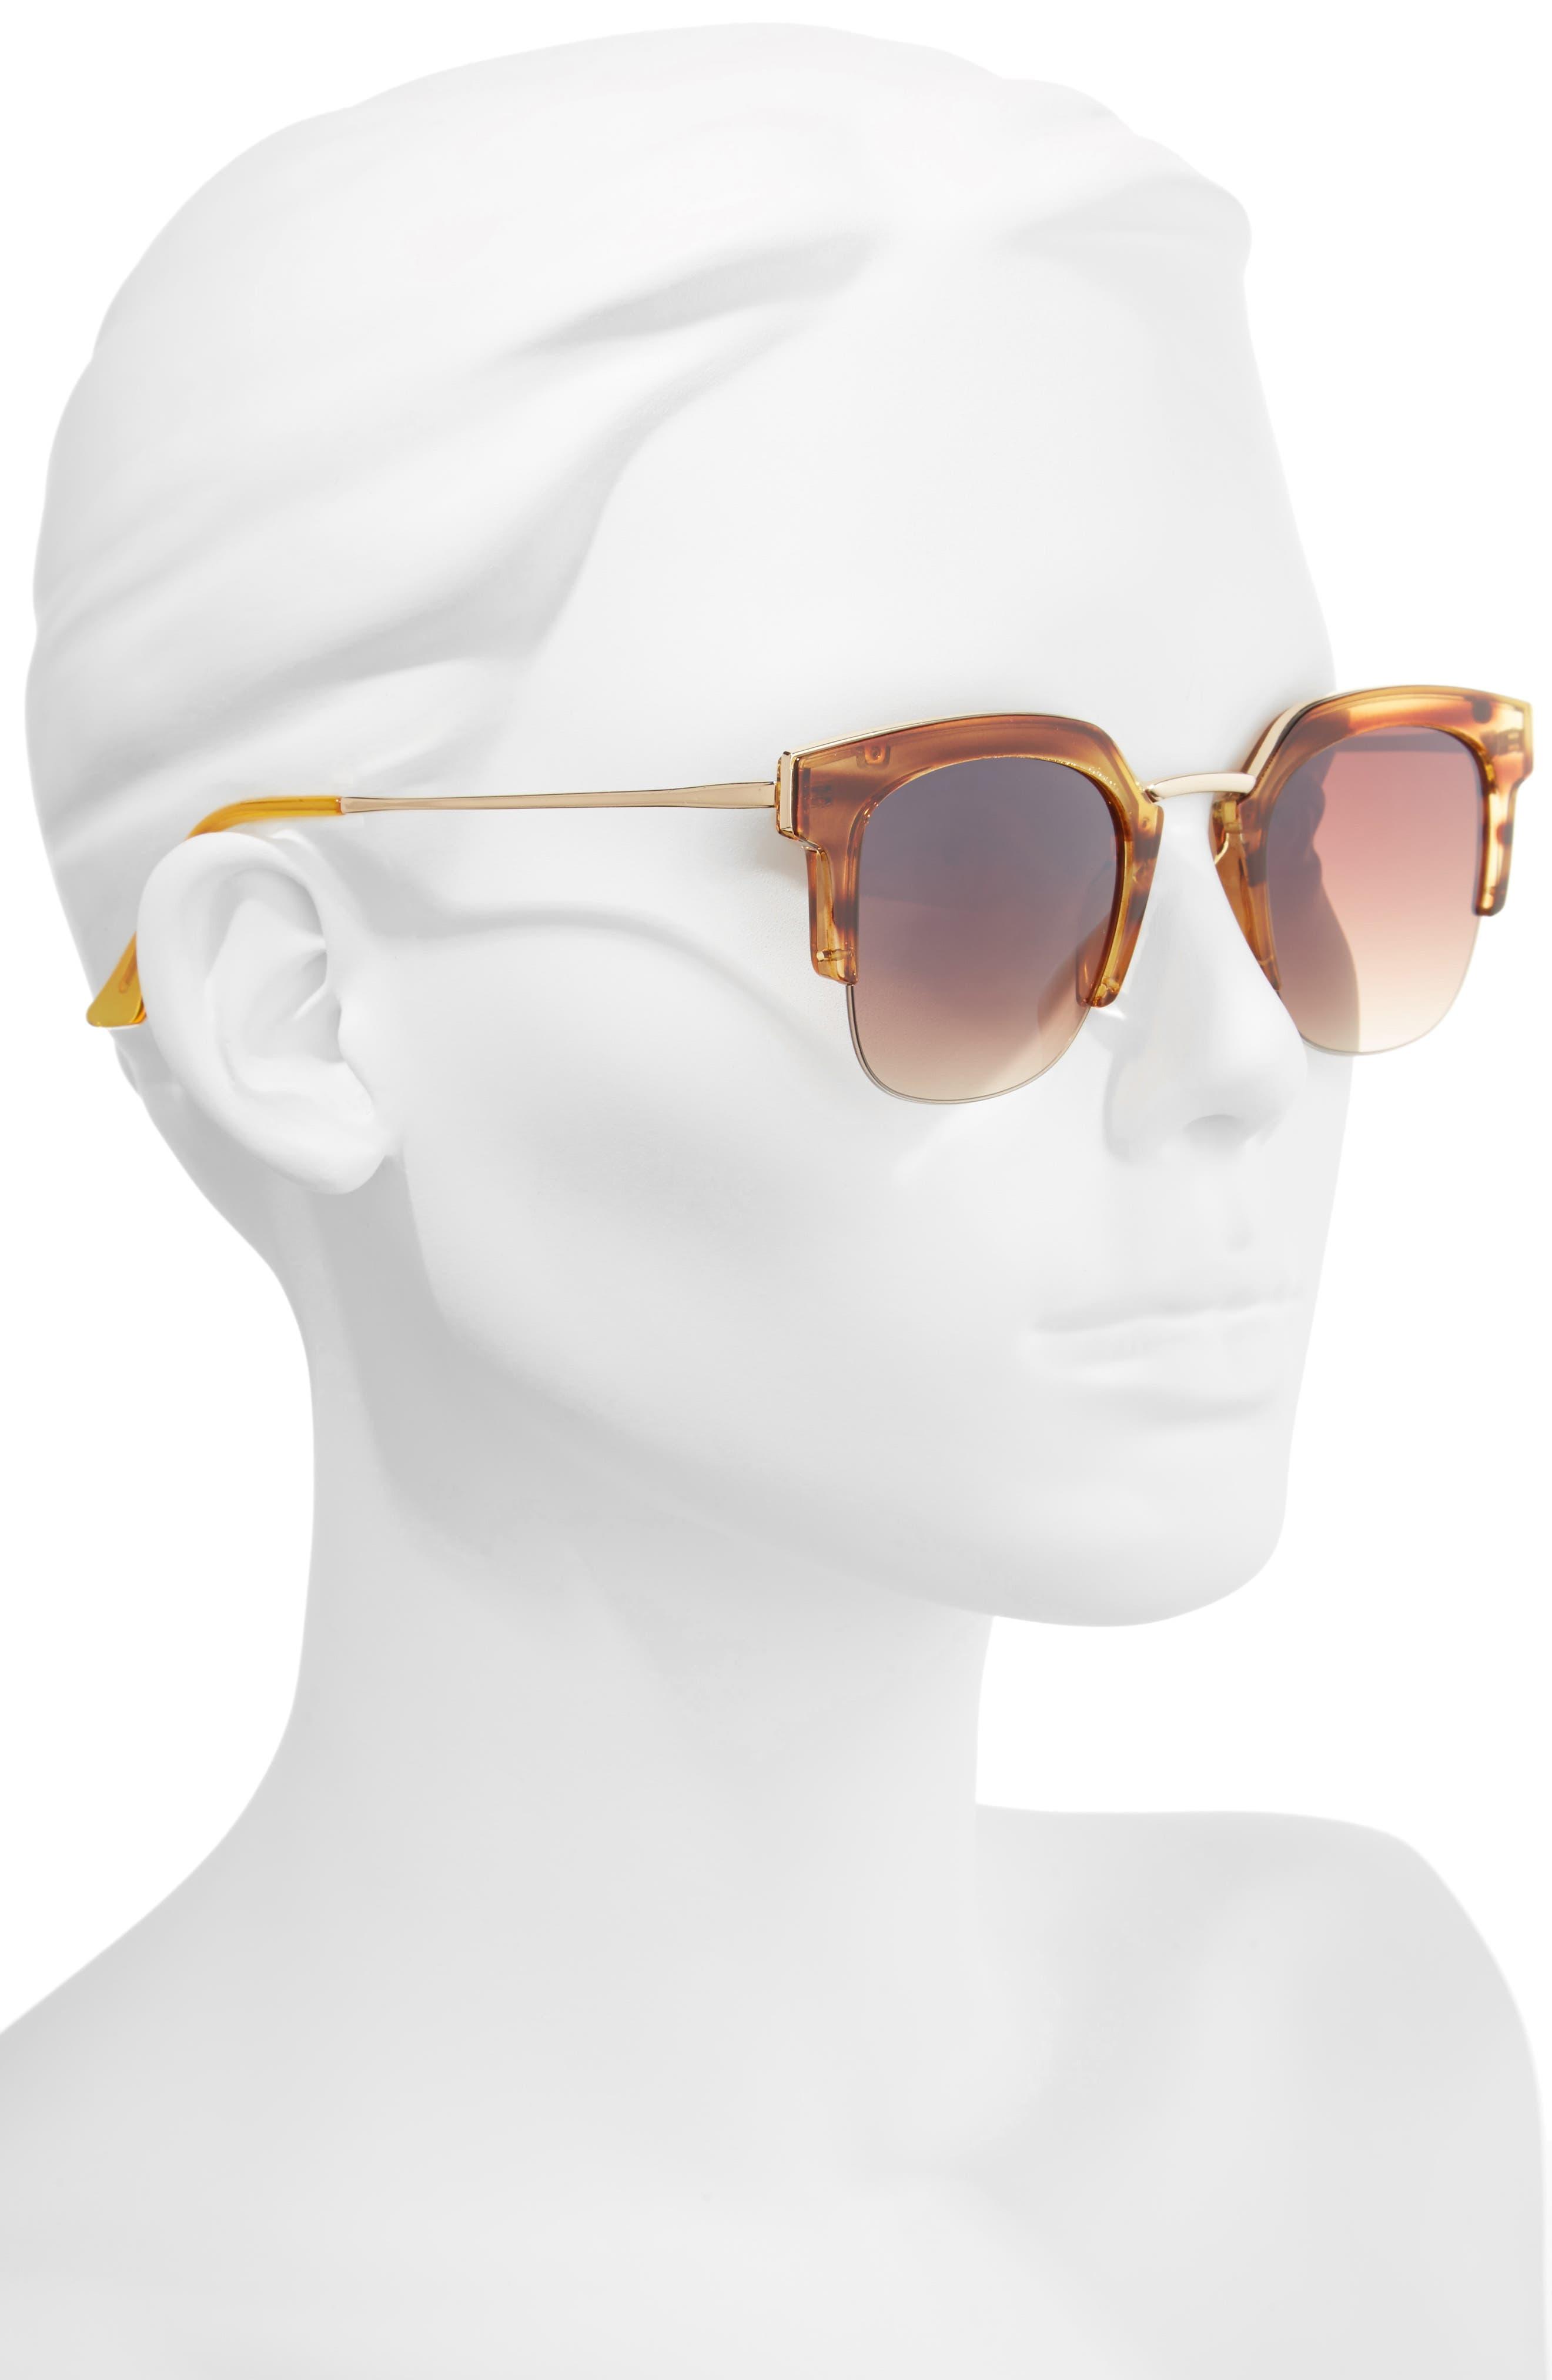 47mm Retro Sunglasses,                             Alternate thumbnail 2, color,                             200